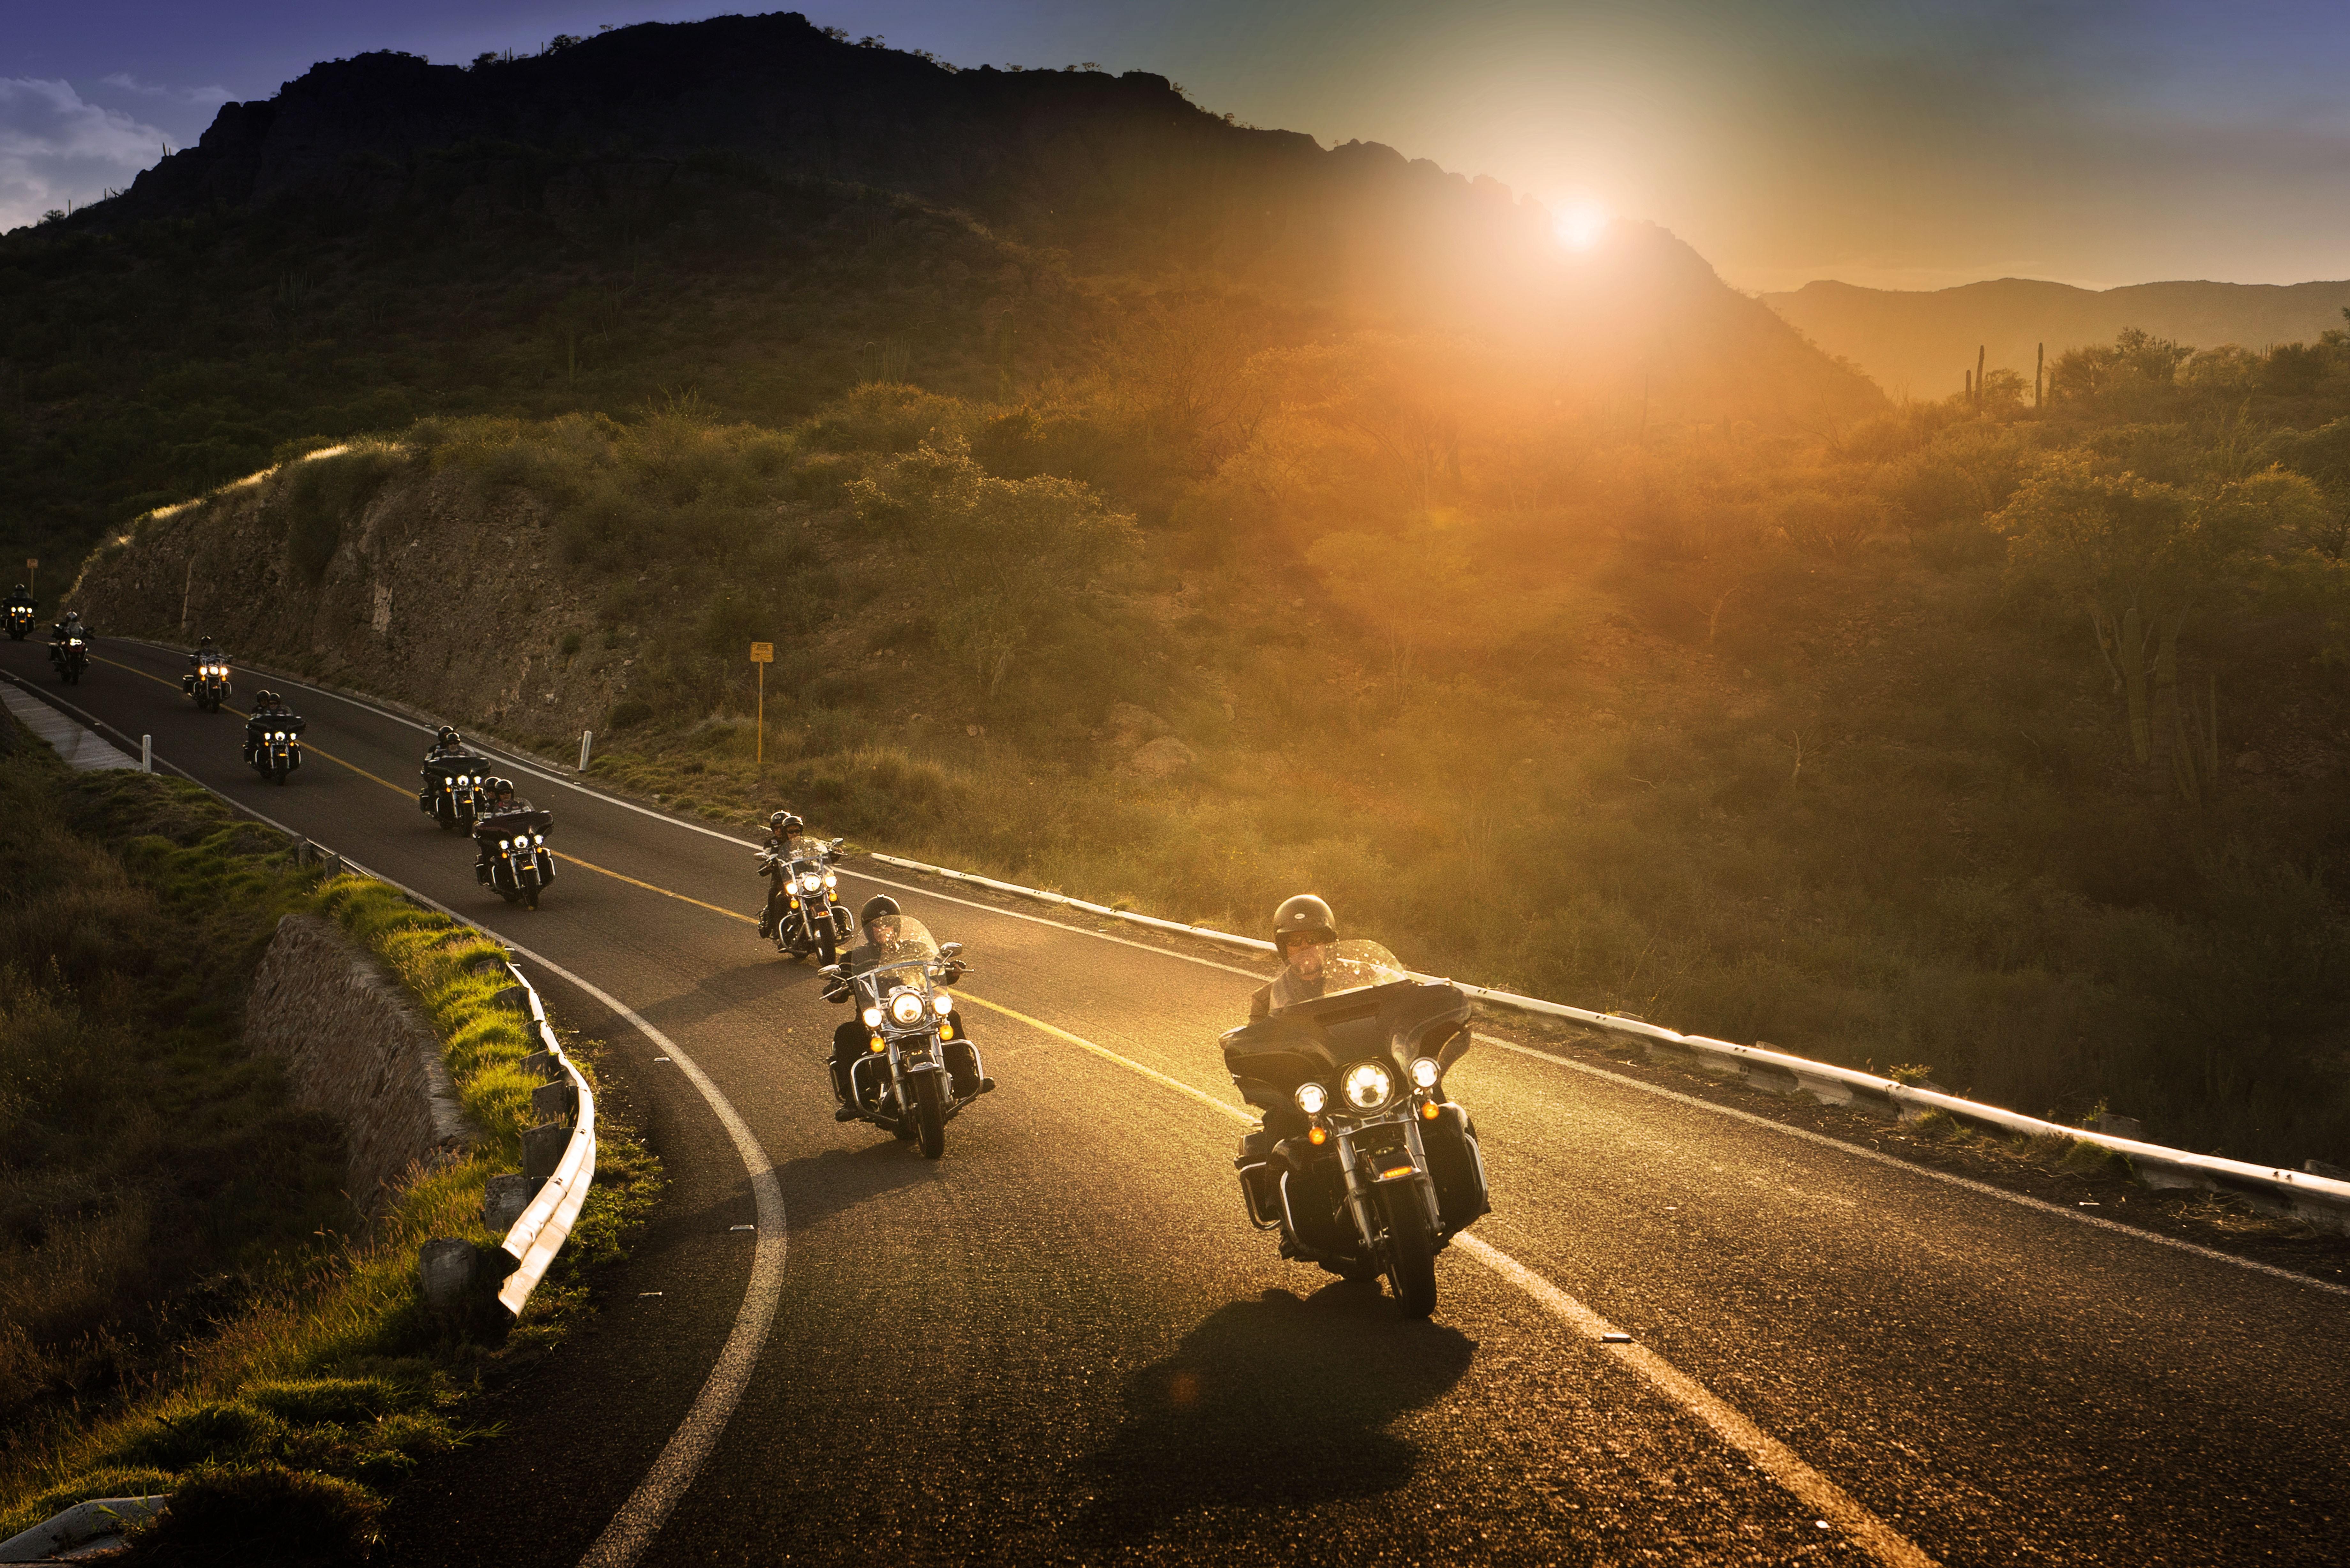 Harley Davidson Riders 8k, HD Bikes, 4k Wallpapers, Images